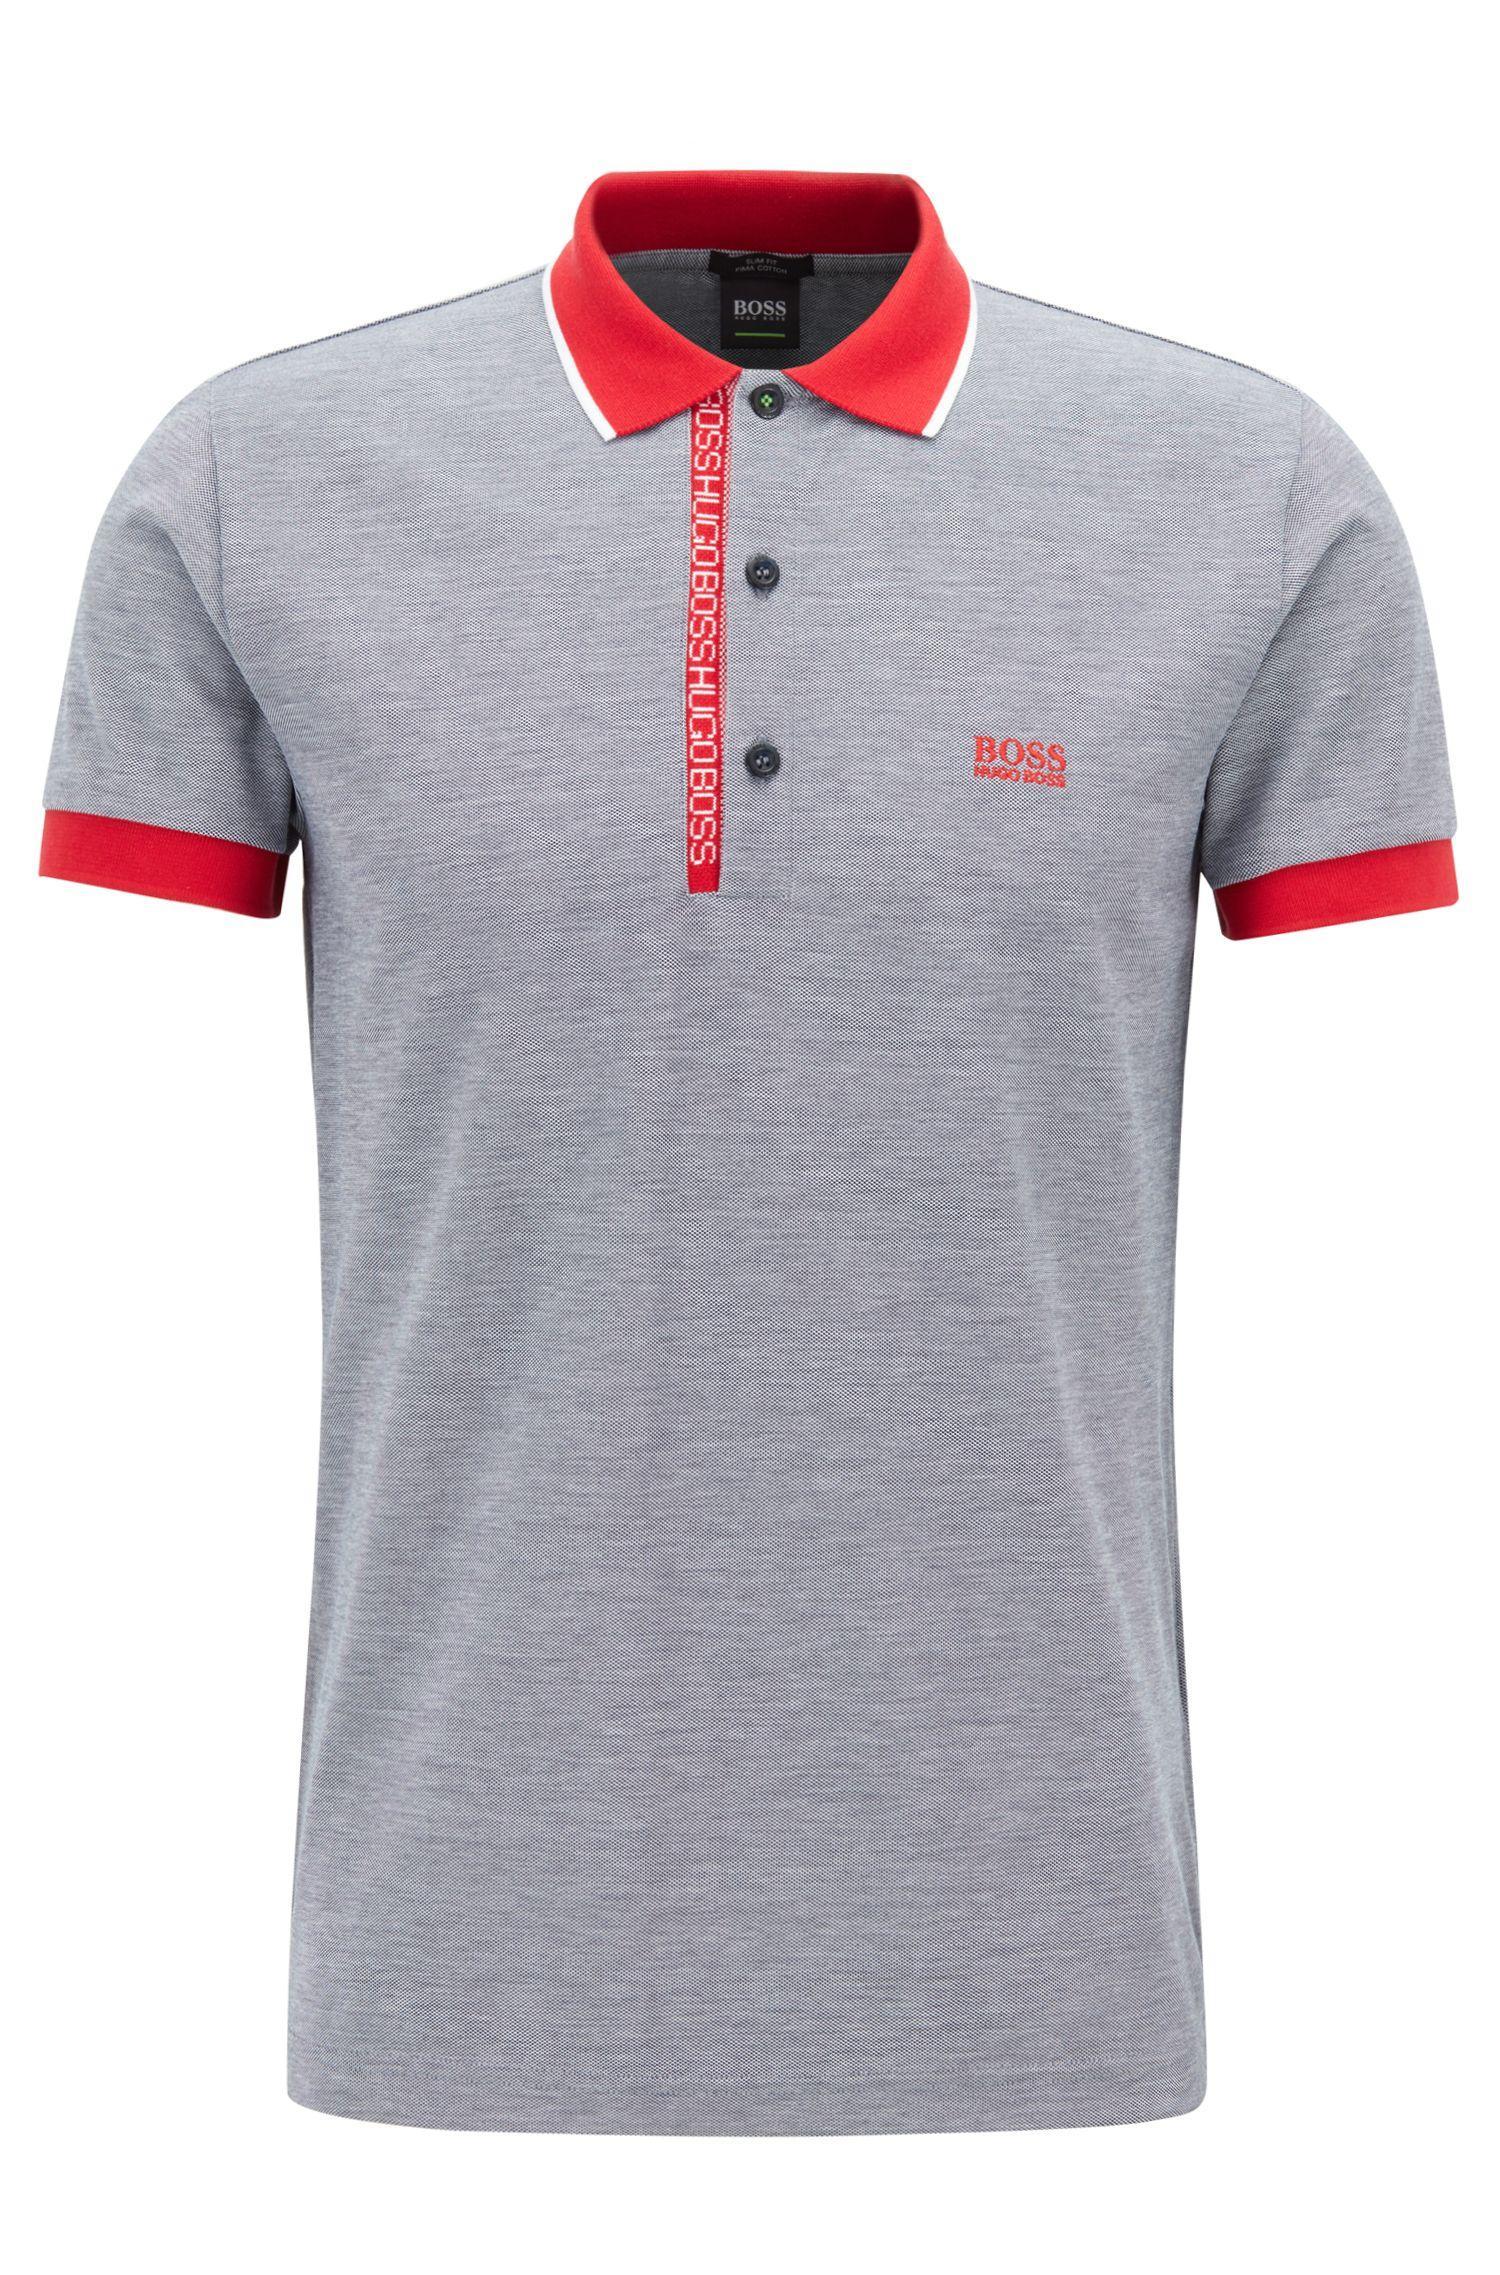 0a9327e0 Hugo Boss Pima Cotton Polo Shirts – EDGE Engineering and Consulting ...